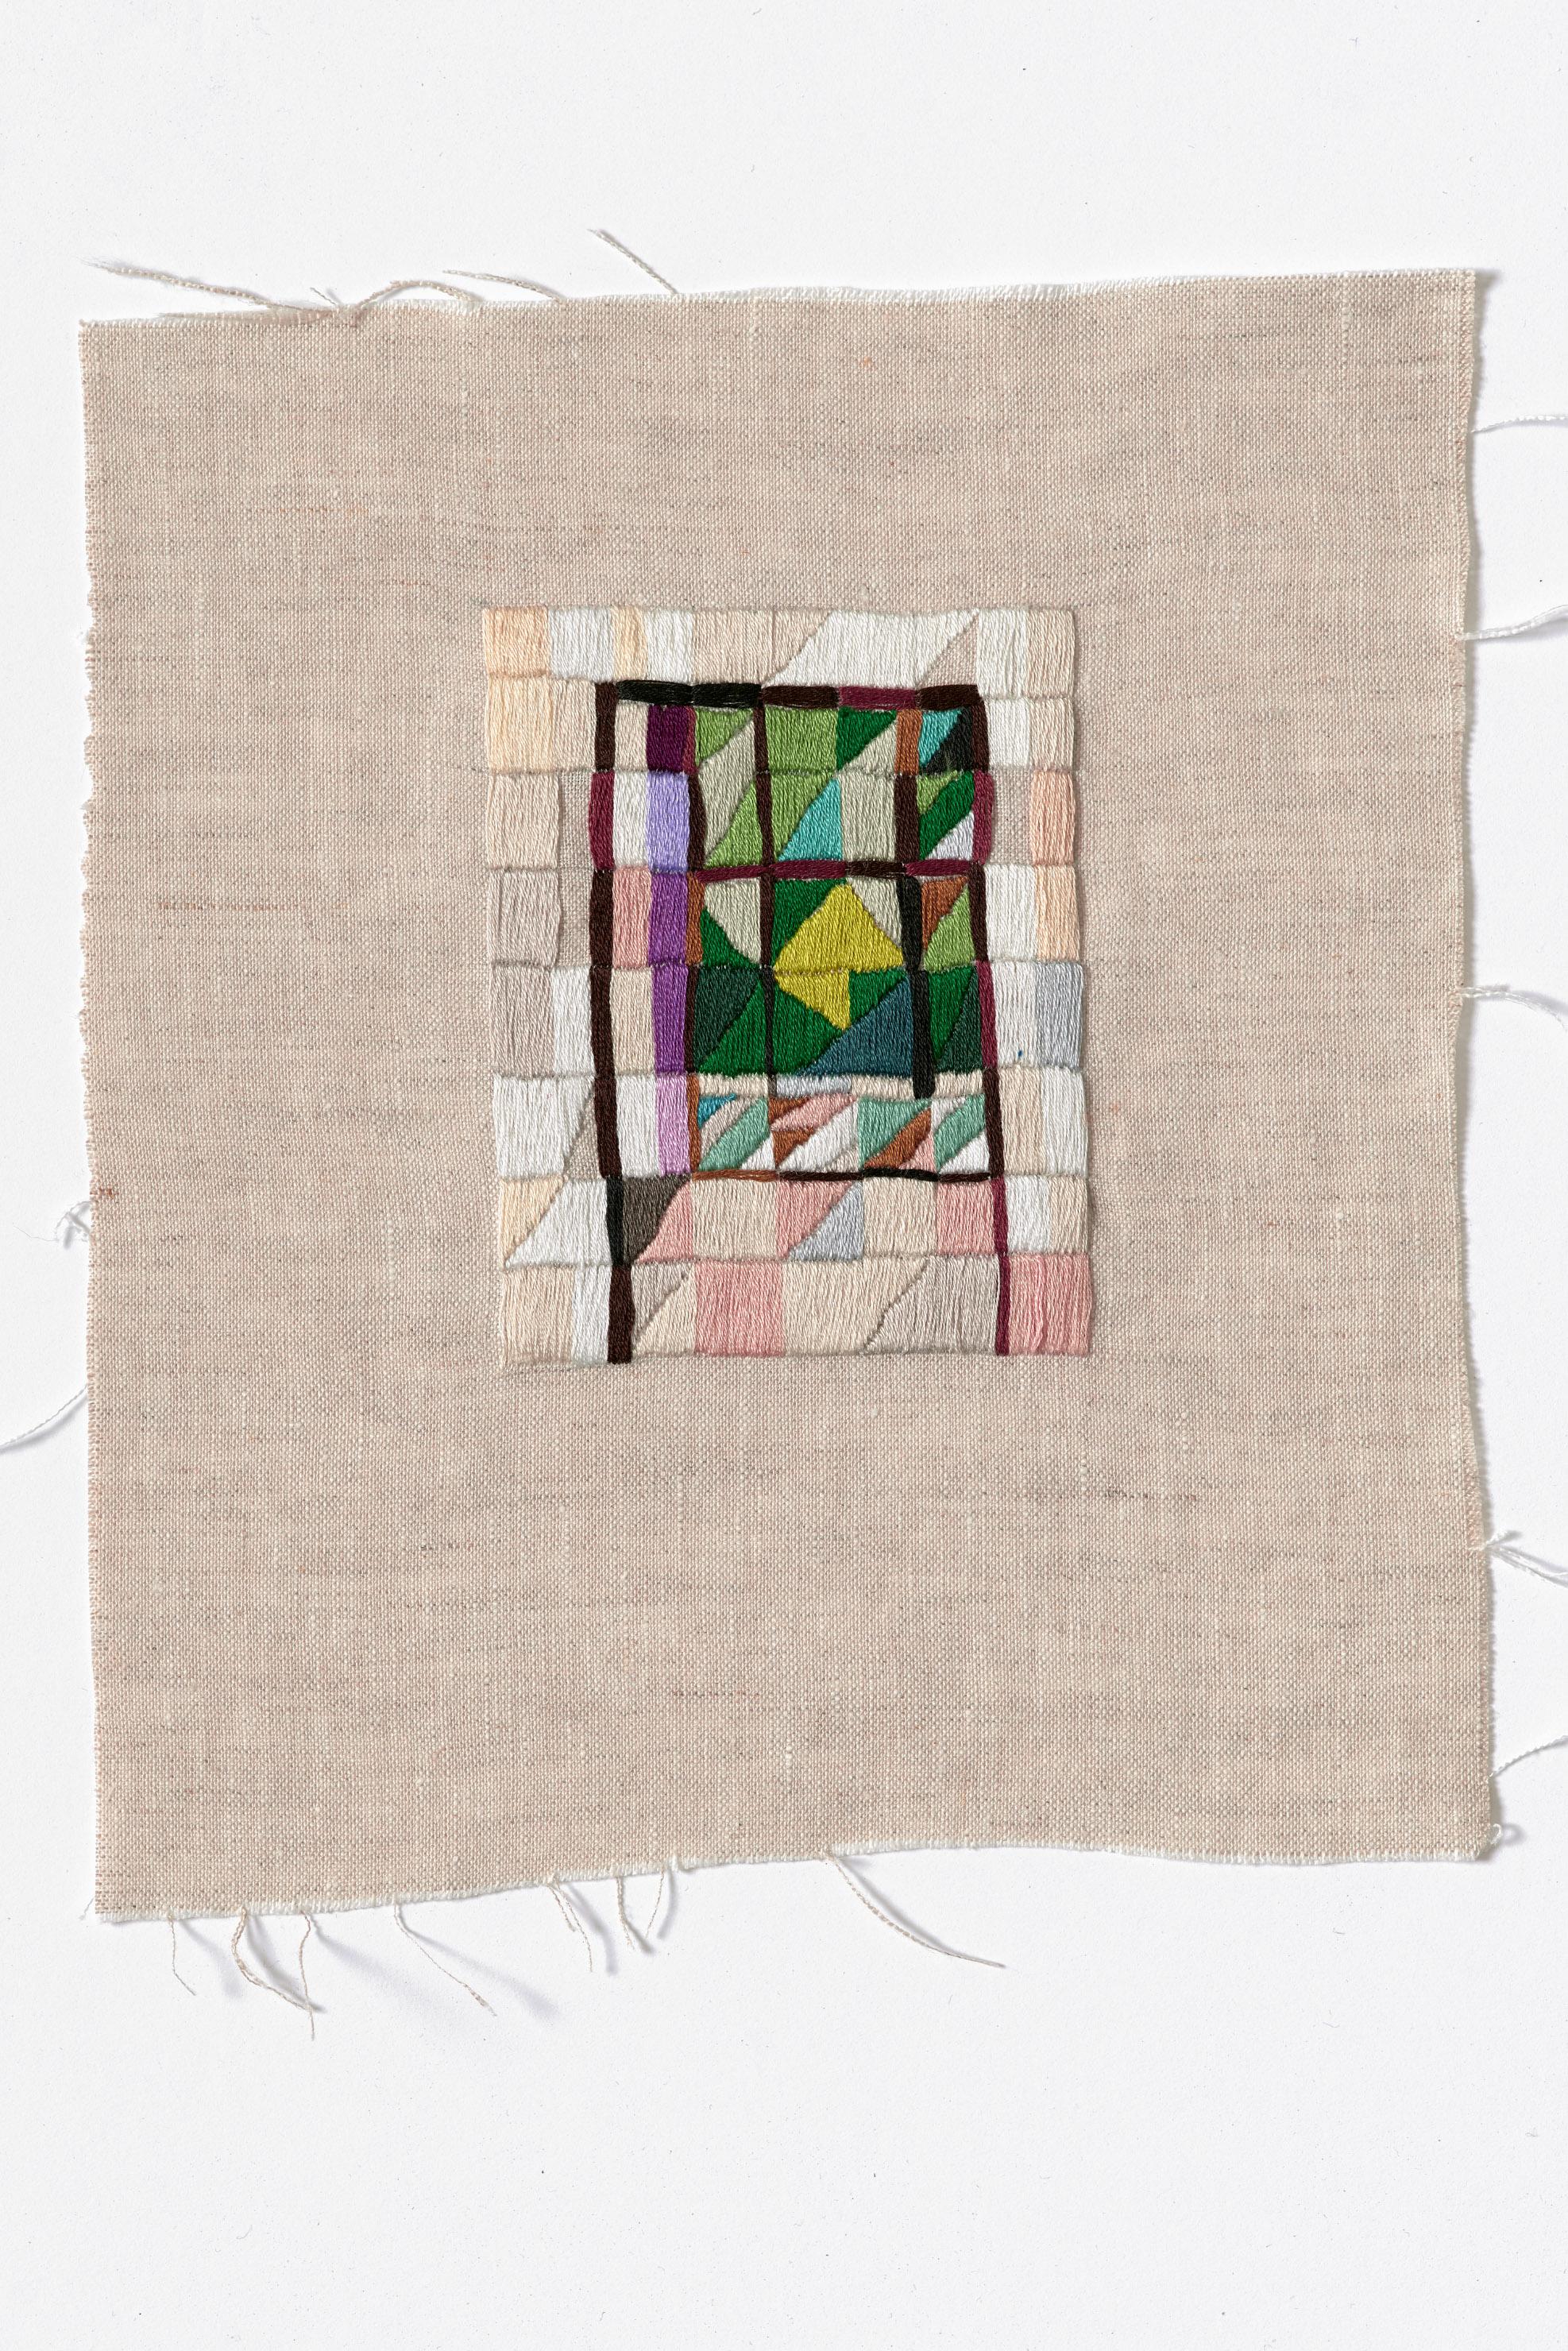 Corridor view, Monty  2015 Cotton thread on linen 24.5 x 28cm